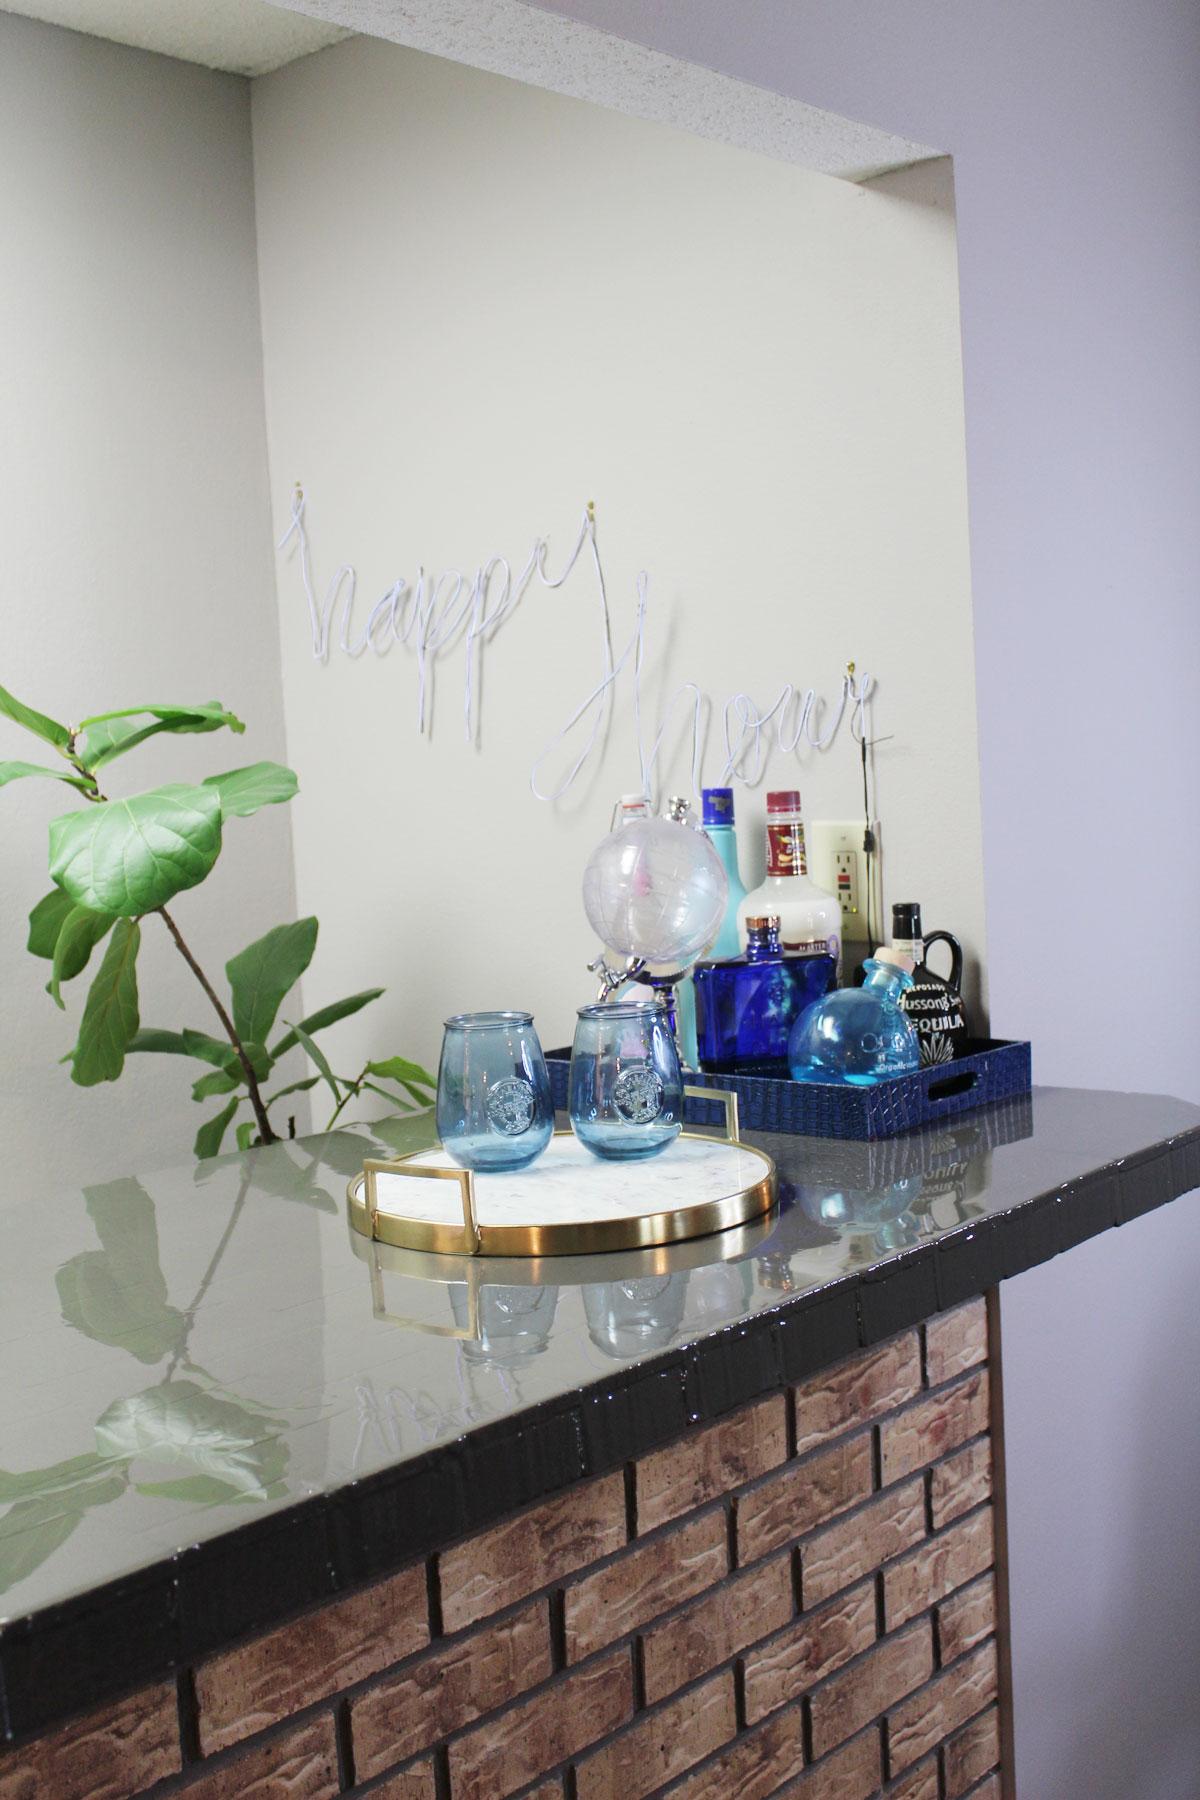 high gloss bar top makeover | whitney j decor | interior design | decorating diy projects | charcoal gray bar | envirotex lite bar | bartop | bar makeover | home bar makeover | large bar | diy resin makeover | diy bar decor | diy resin decor